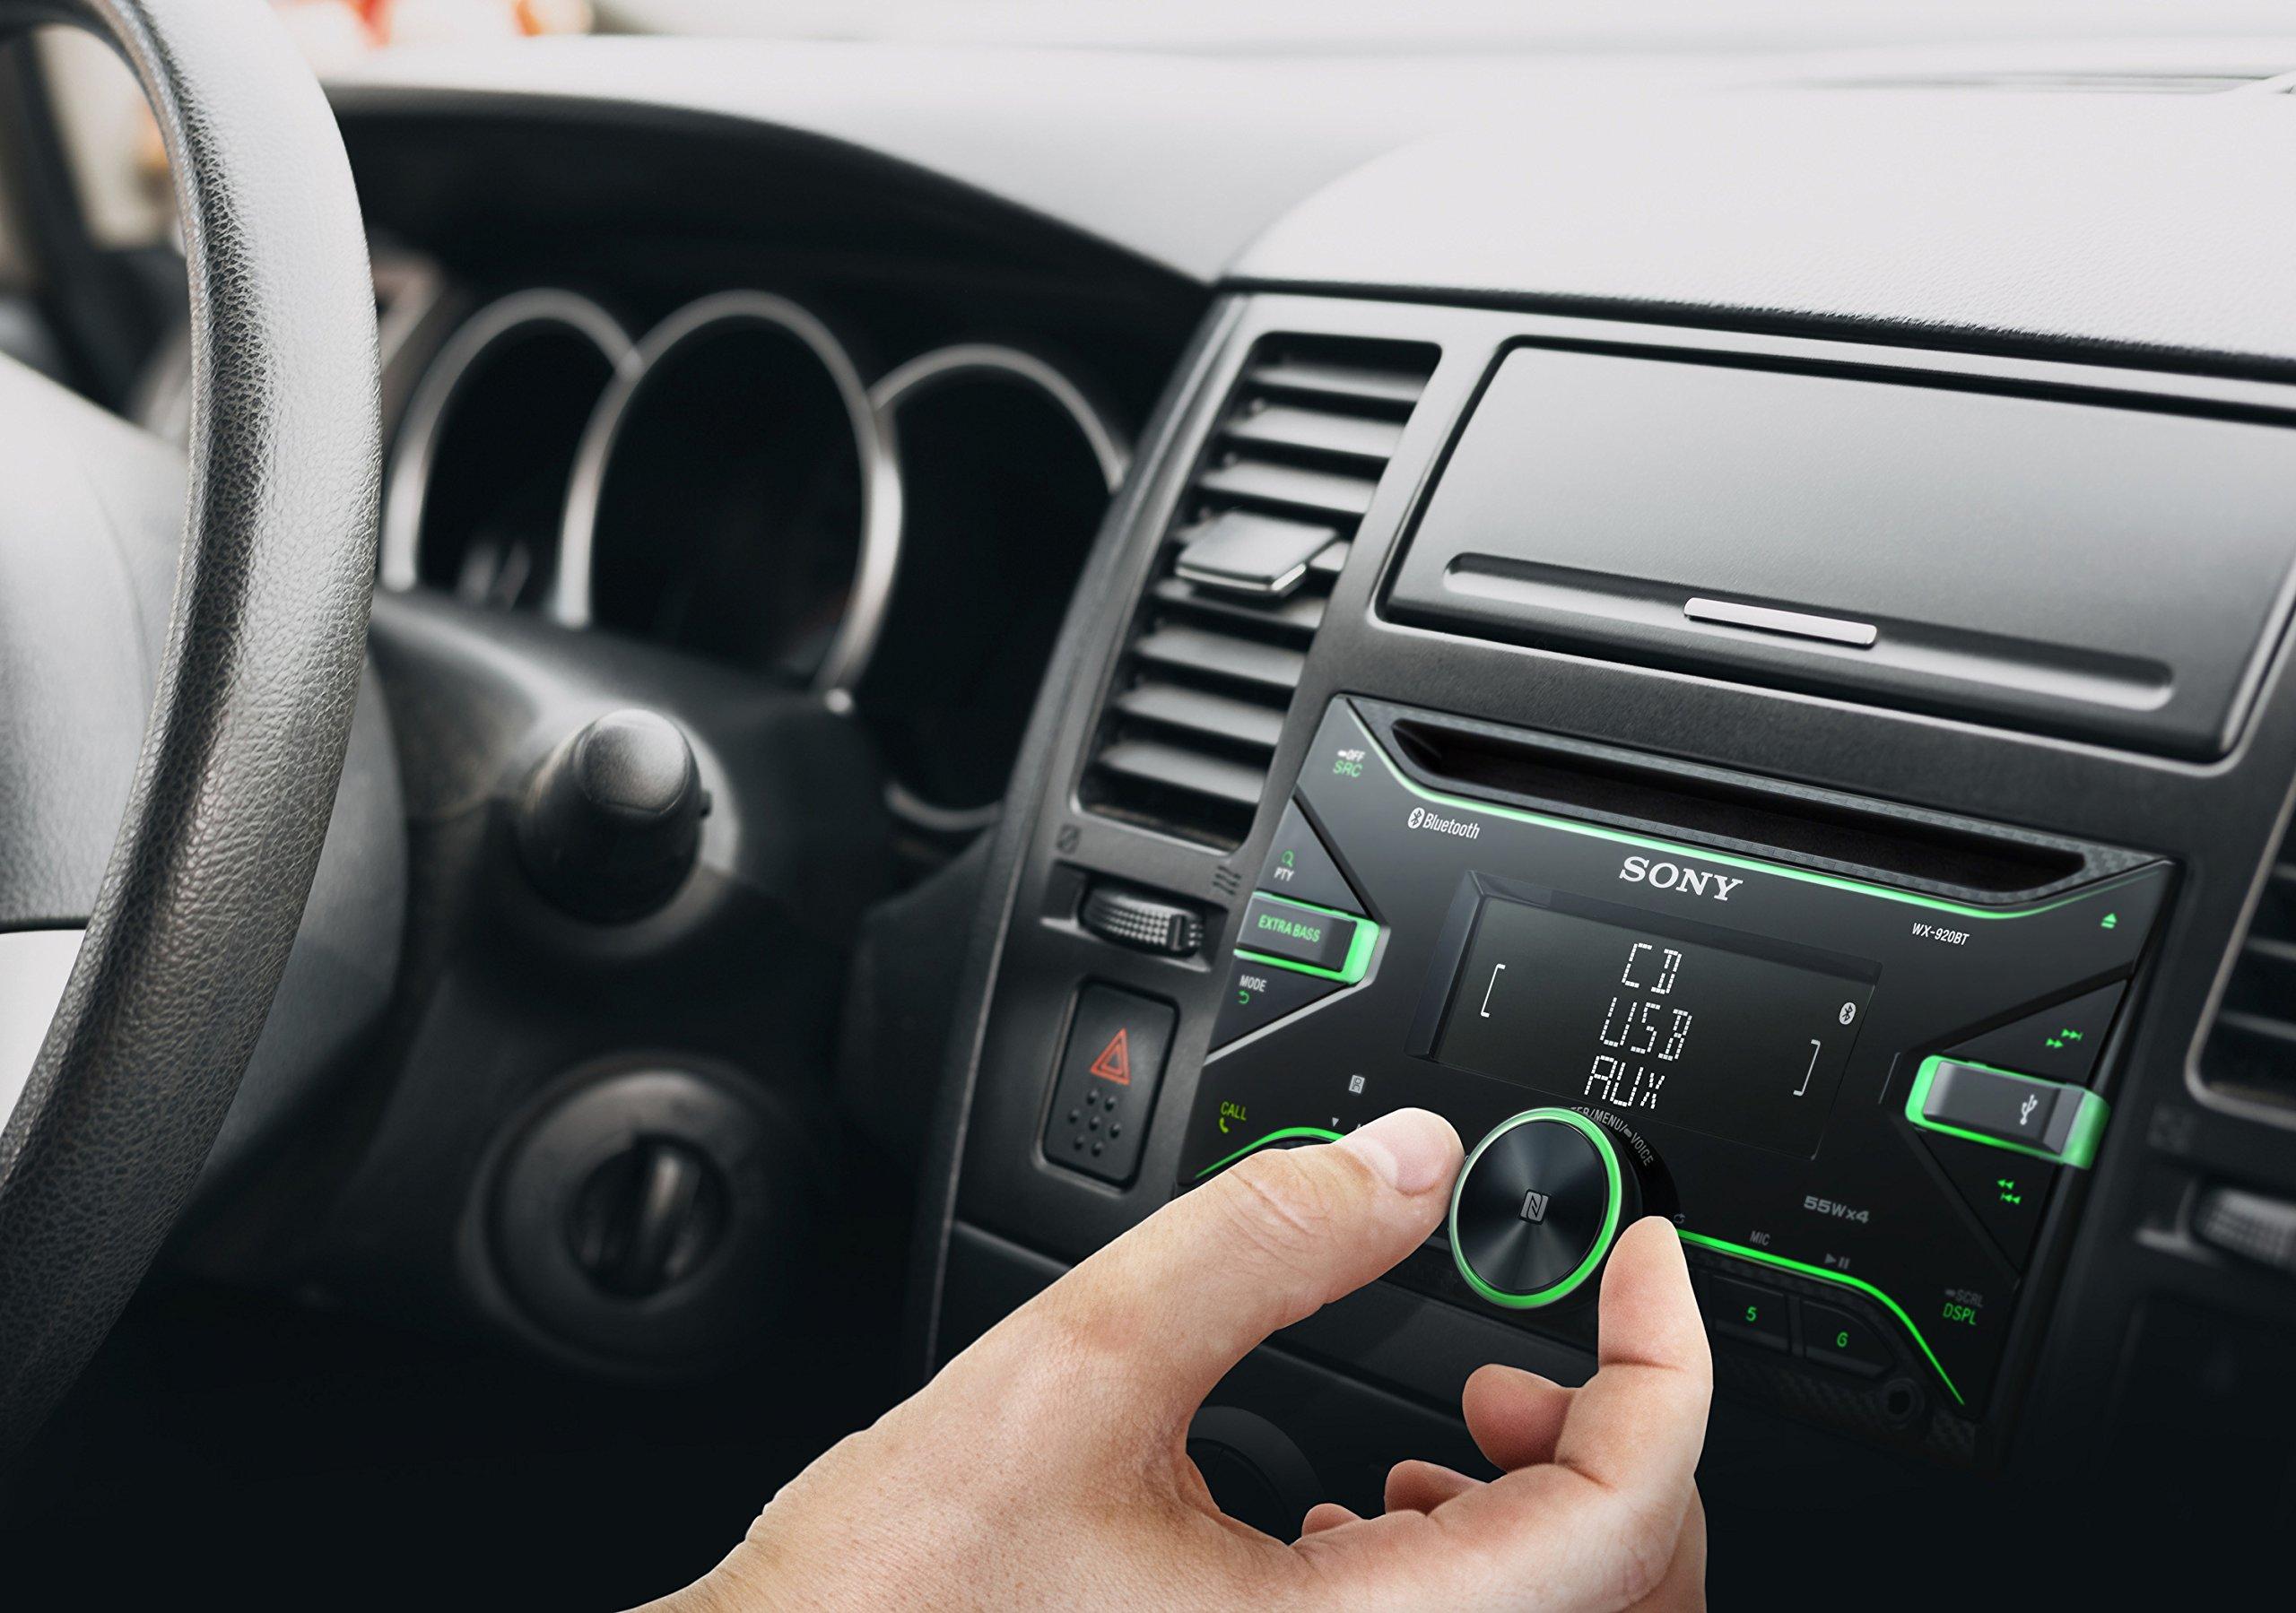 Sony-WX-800UI-2-Din-CD-Autoradio-USB-und-Aux-Anschluss-Apple-iPodiPhone-Control-Funktion-fr-RadioMP3WMAFLAC-Schwarz